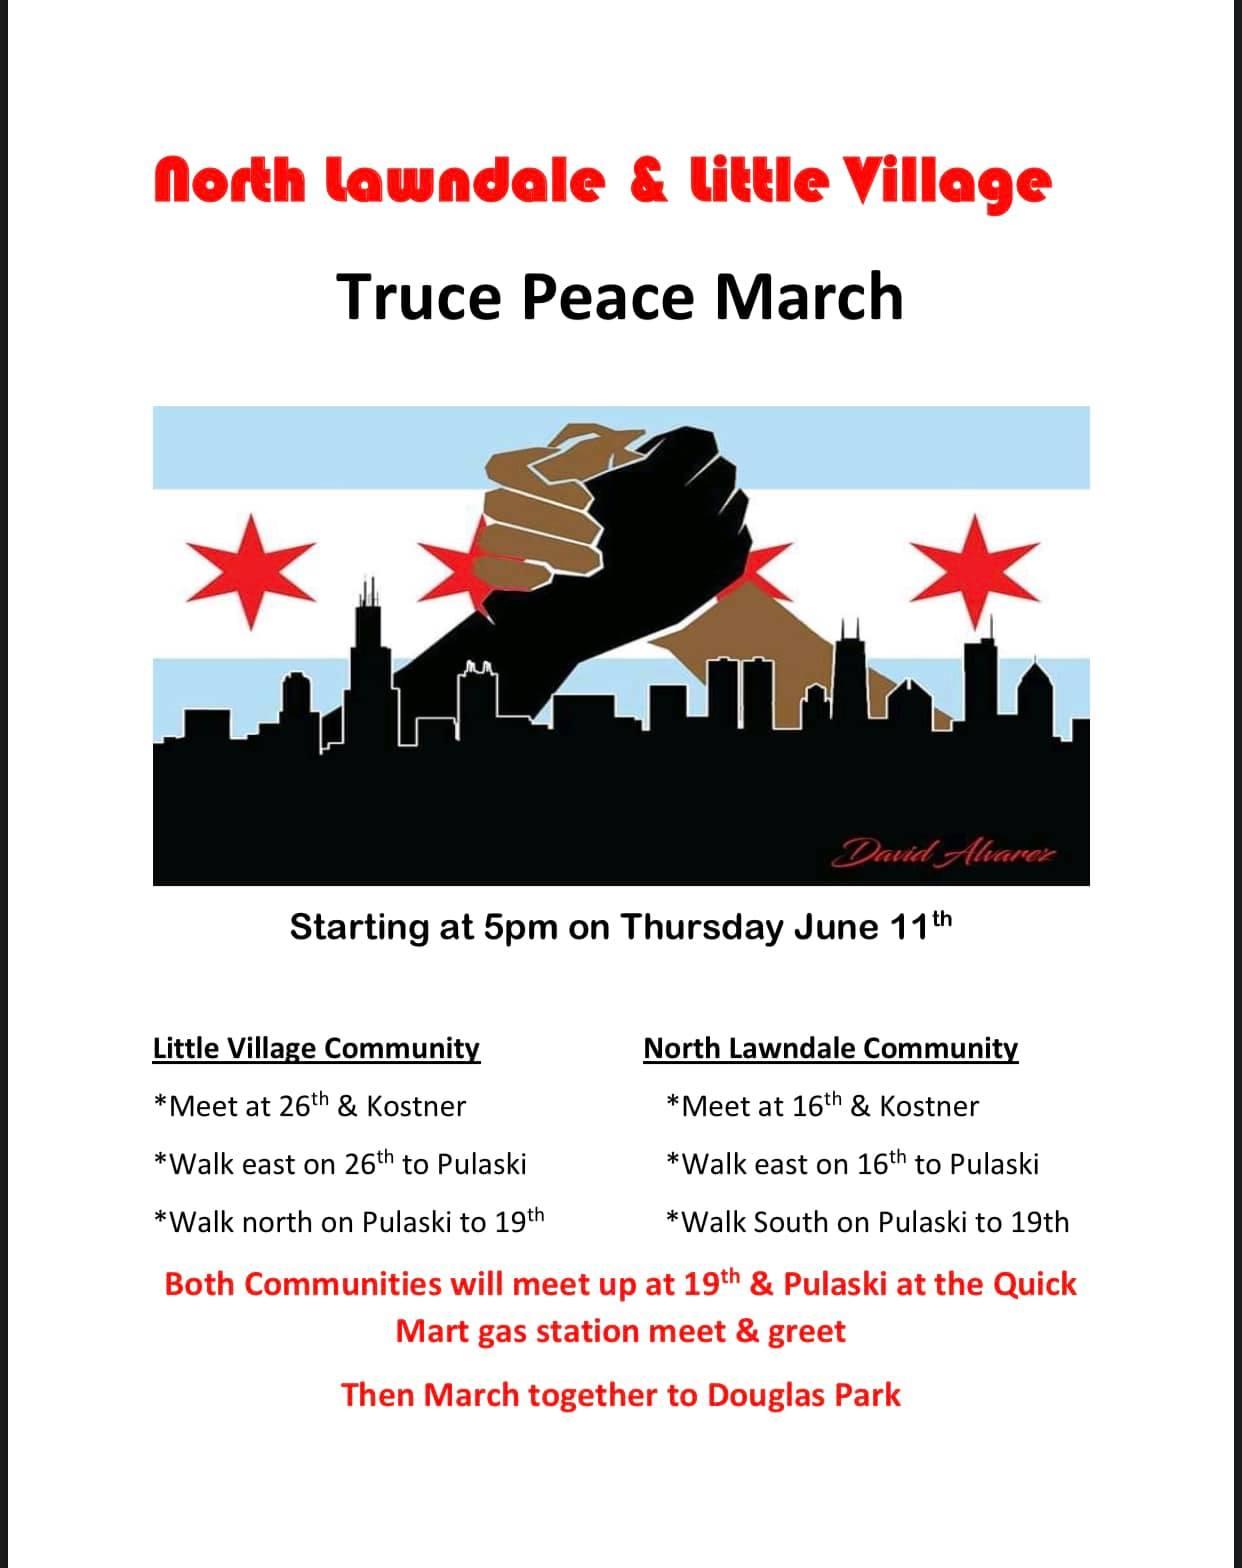 North Lawndale & Little Village Truce Peace March